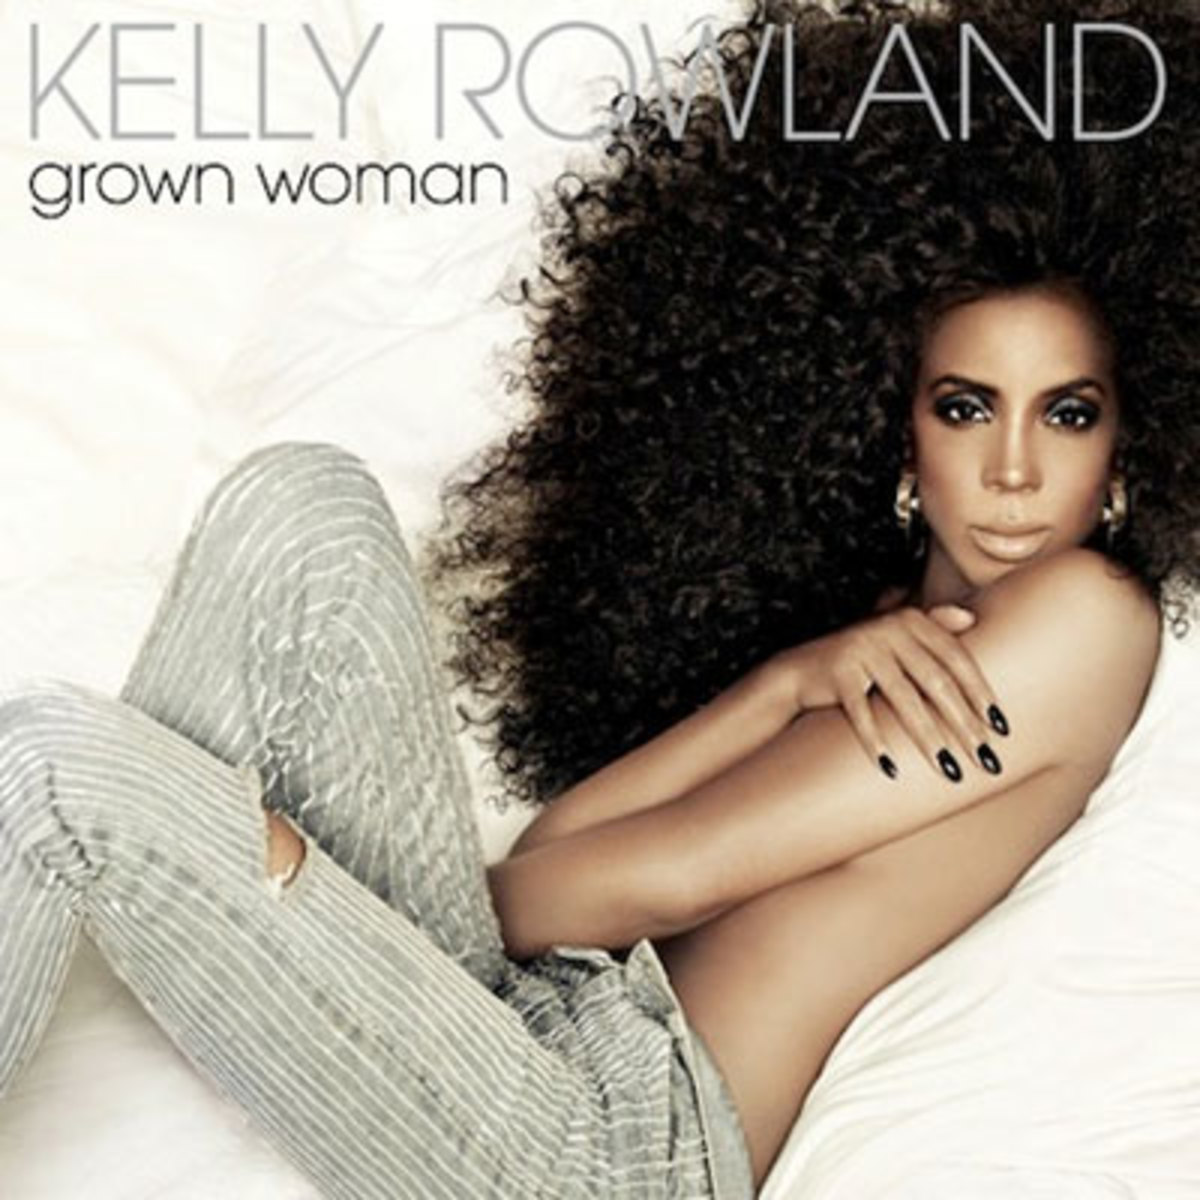 kellyrowland-grownwoman.jpg